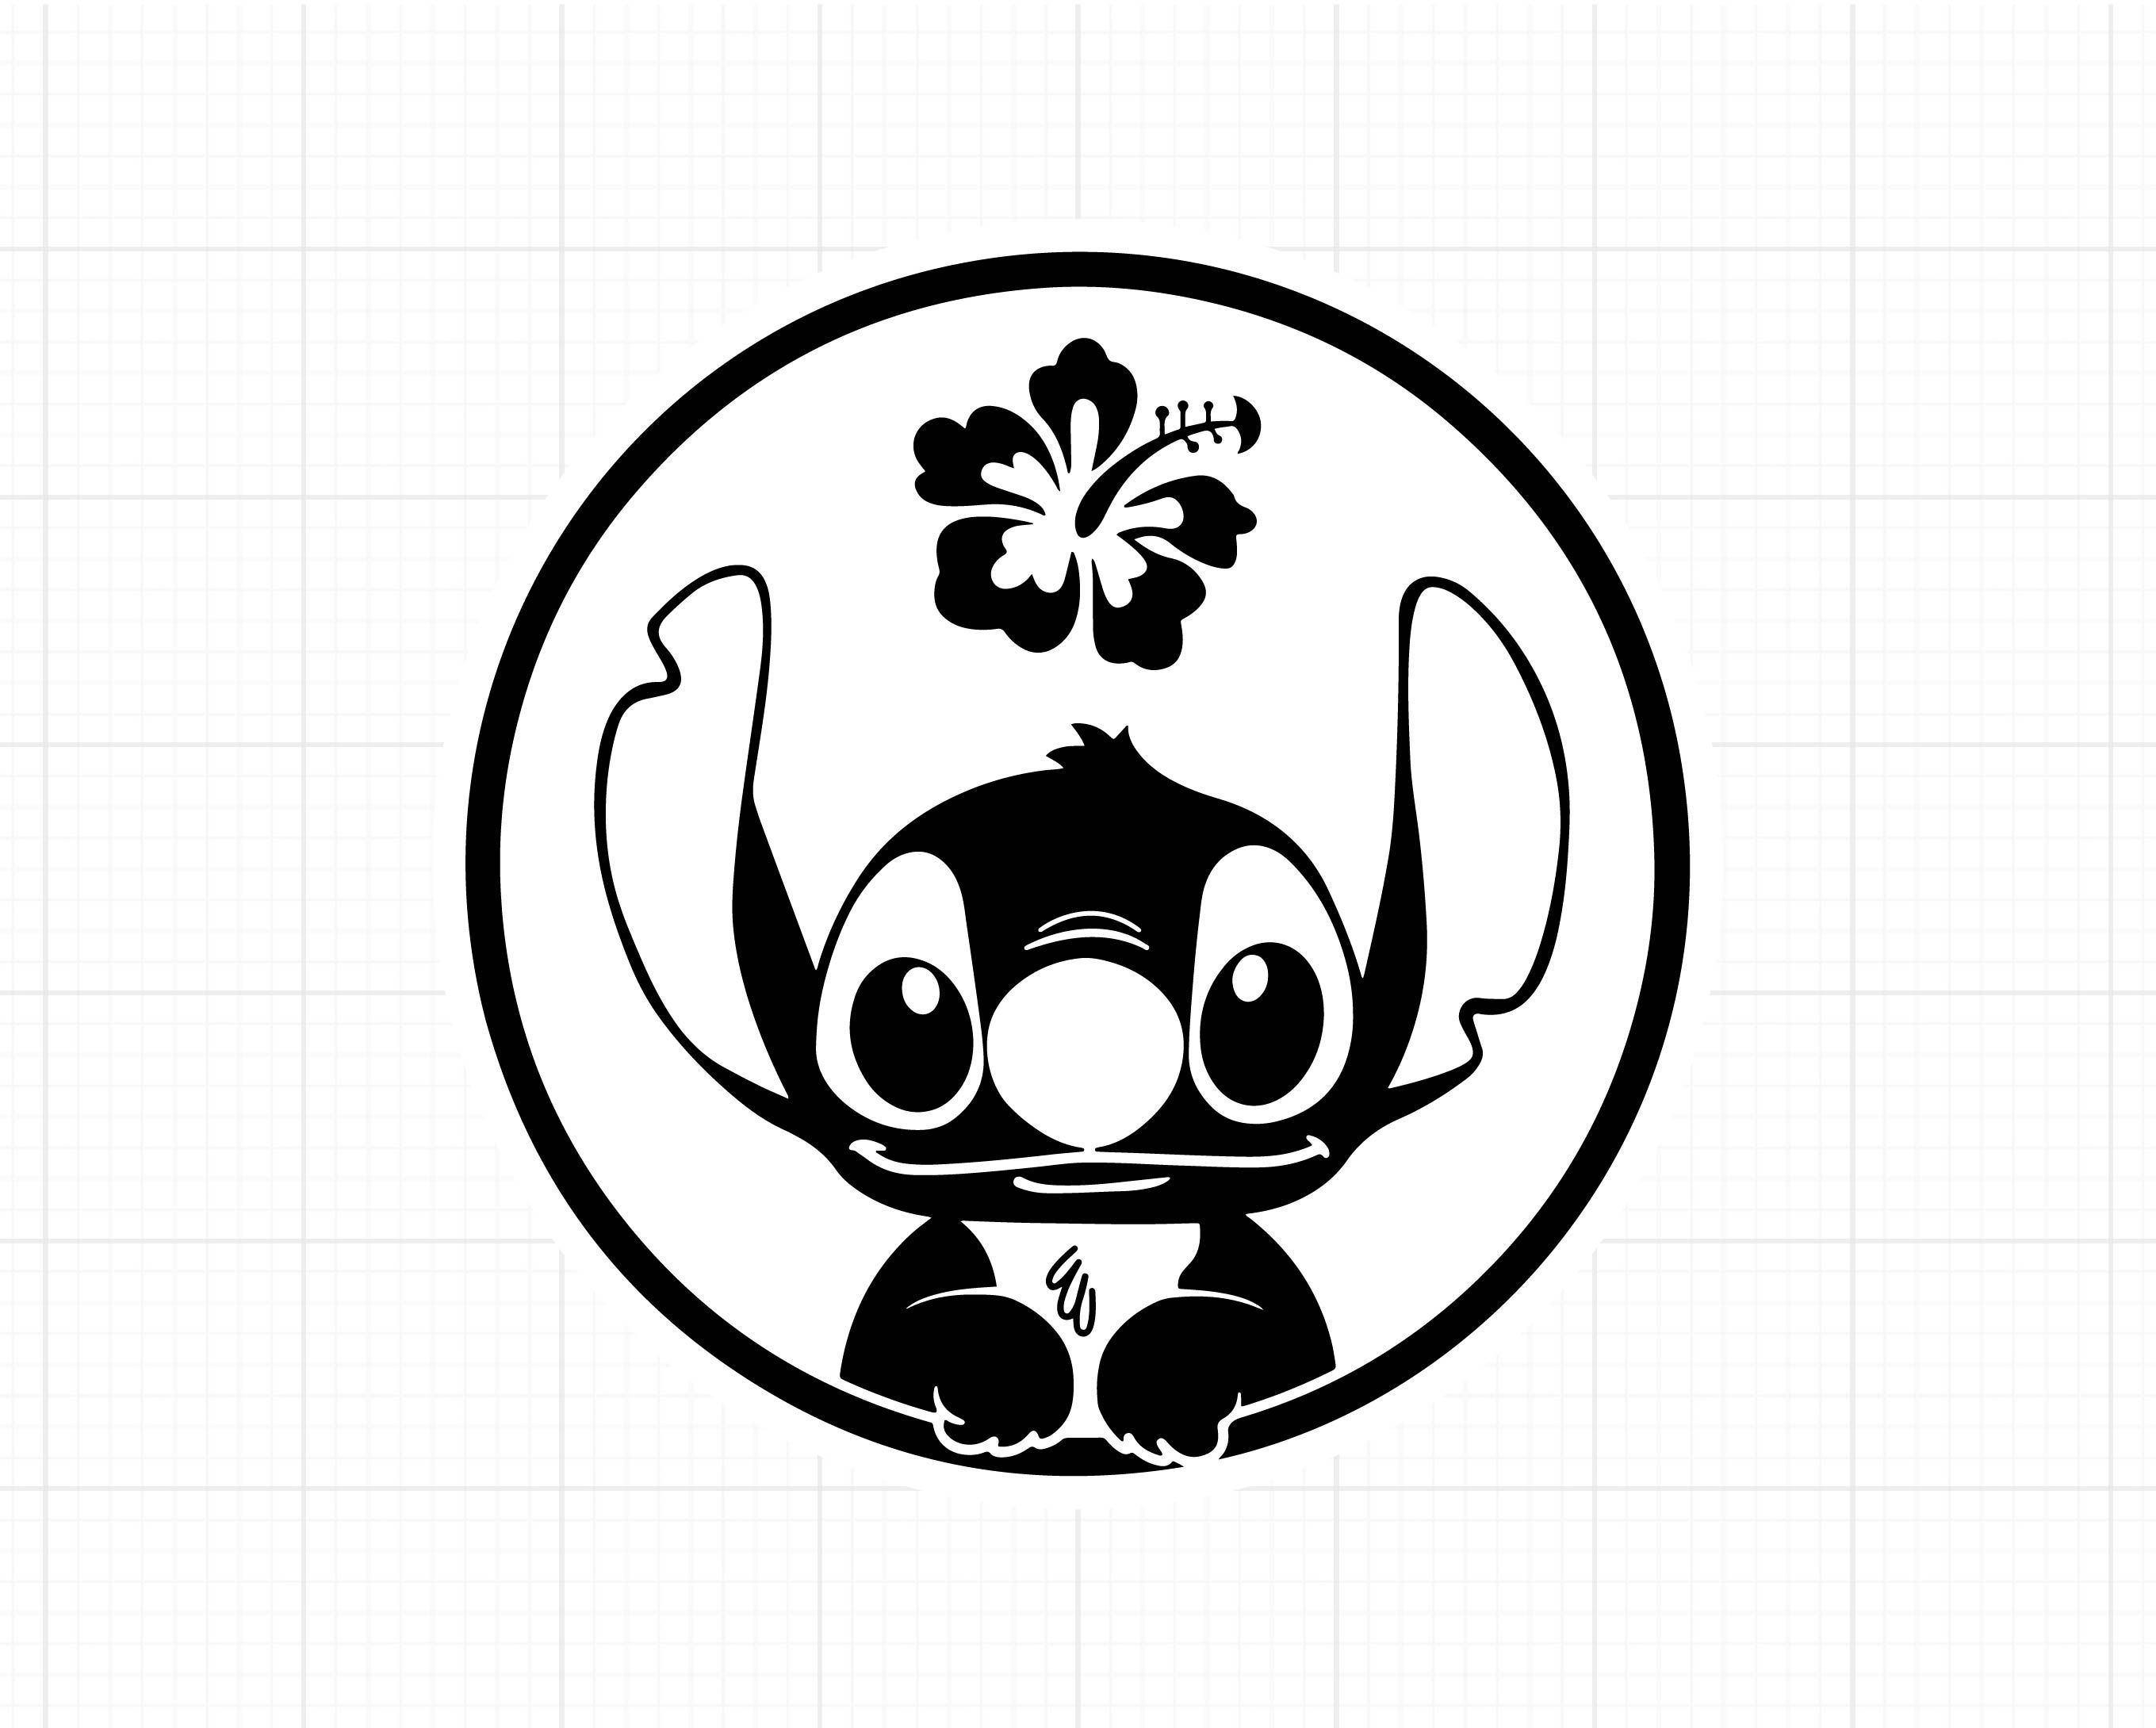 Stitch svg, Lilo and Stitch SVG, Lilo and Stitch clipart